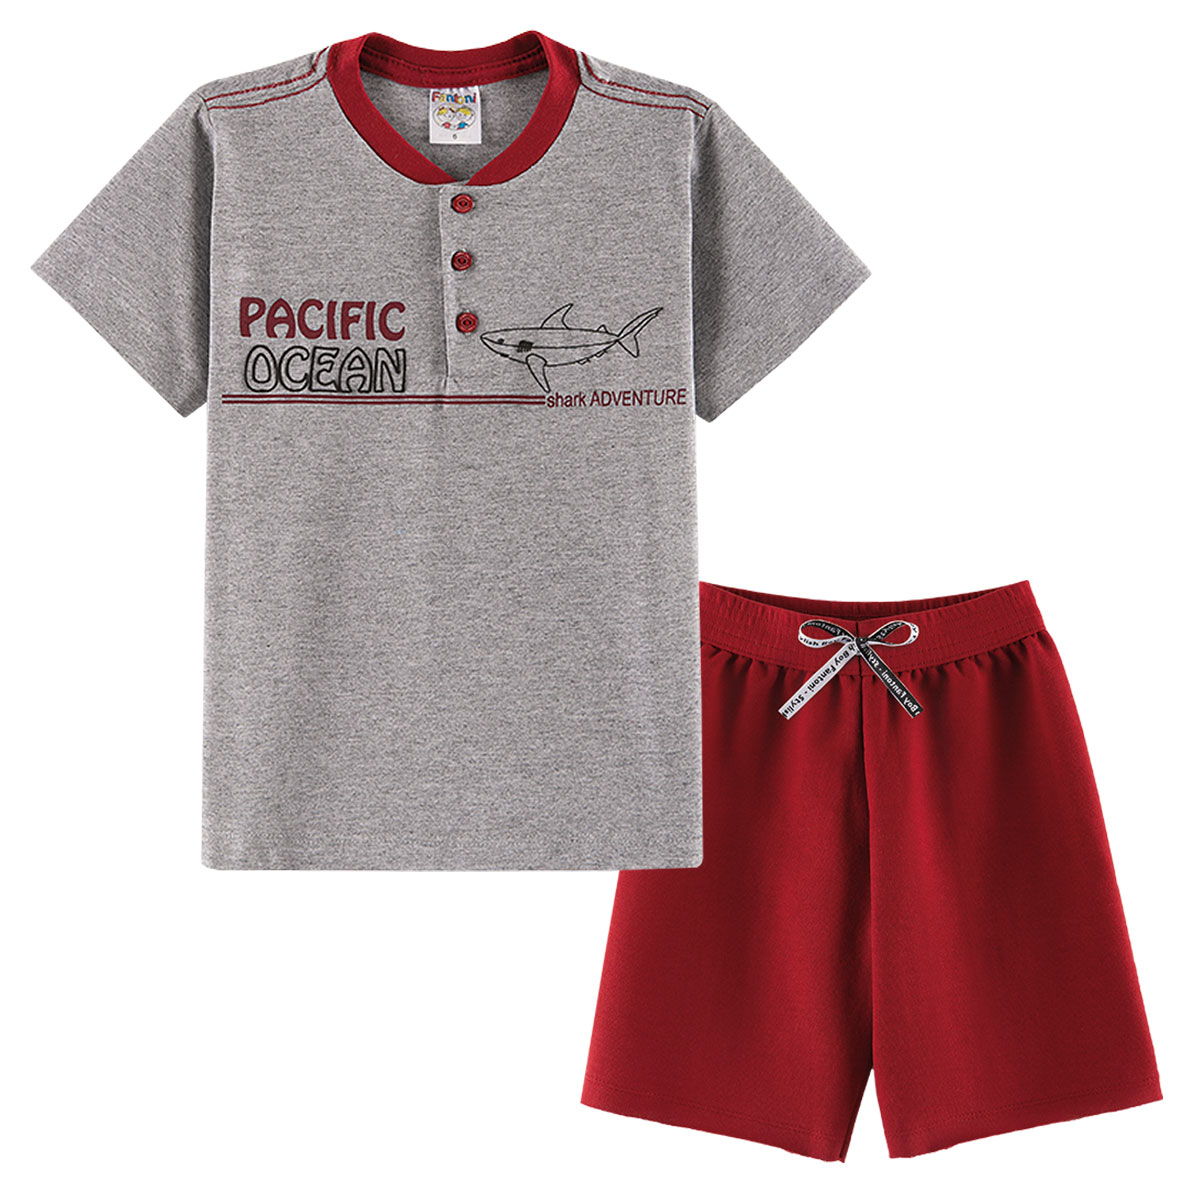 Conjunto Infantil Menino Verão Pacific Ocean Shark Vermelho